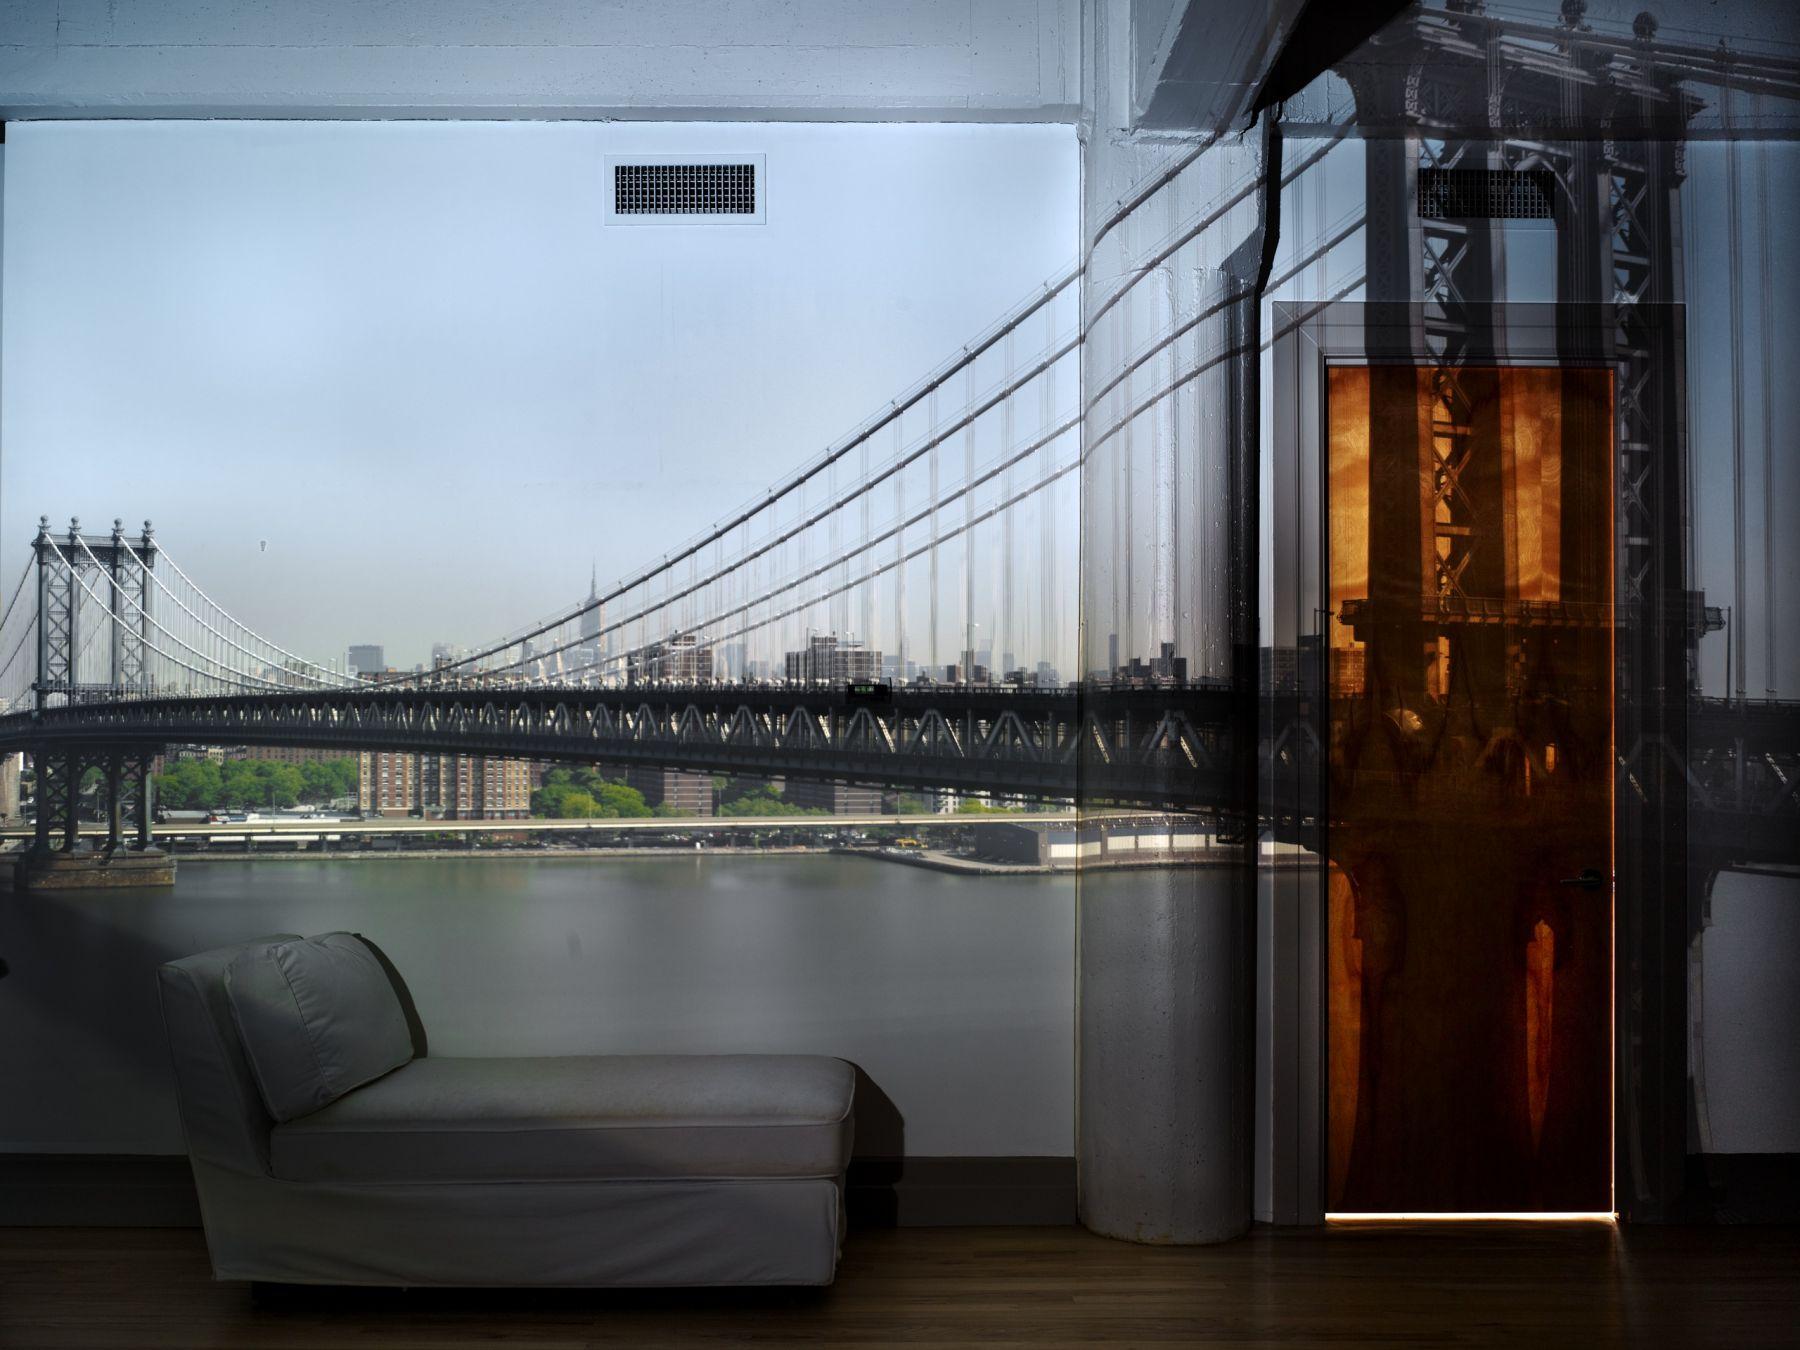 Abelardo Morell, Camera Obscura: View of the Manhattan Bridge, April 30th, Morning, 2010